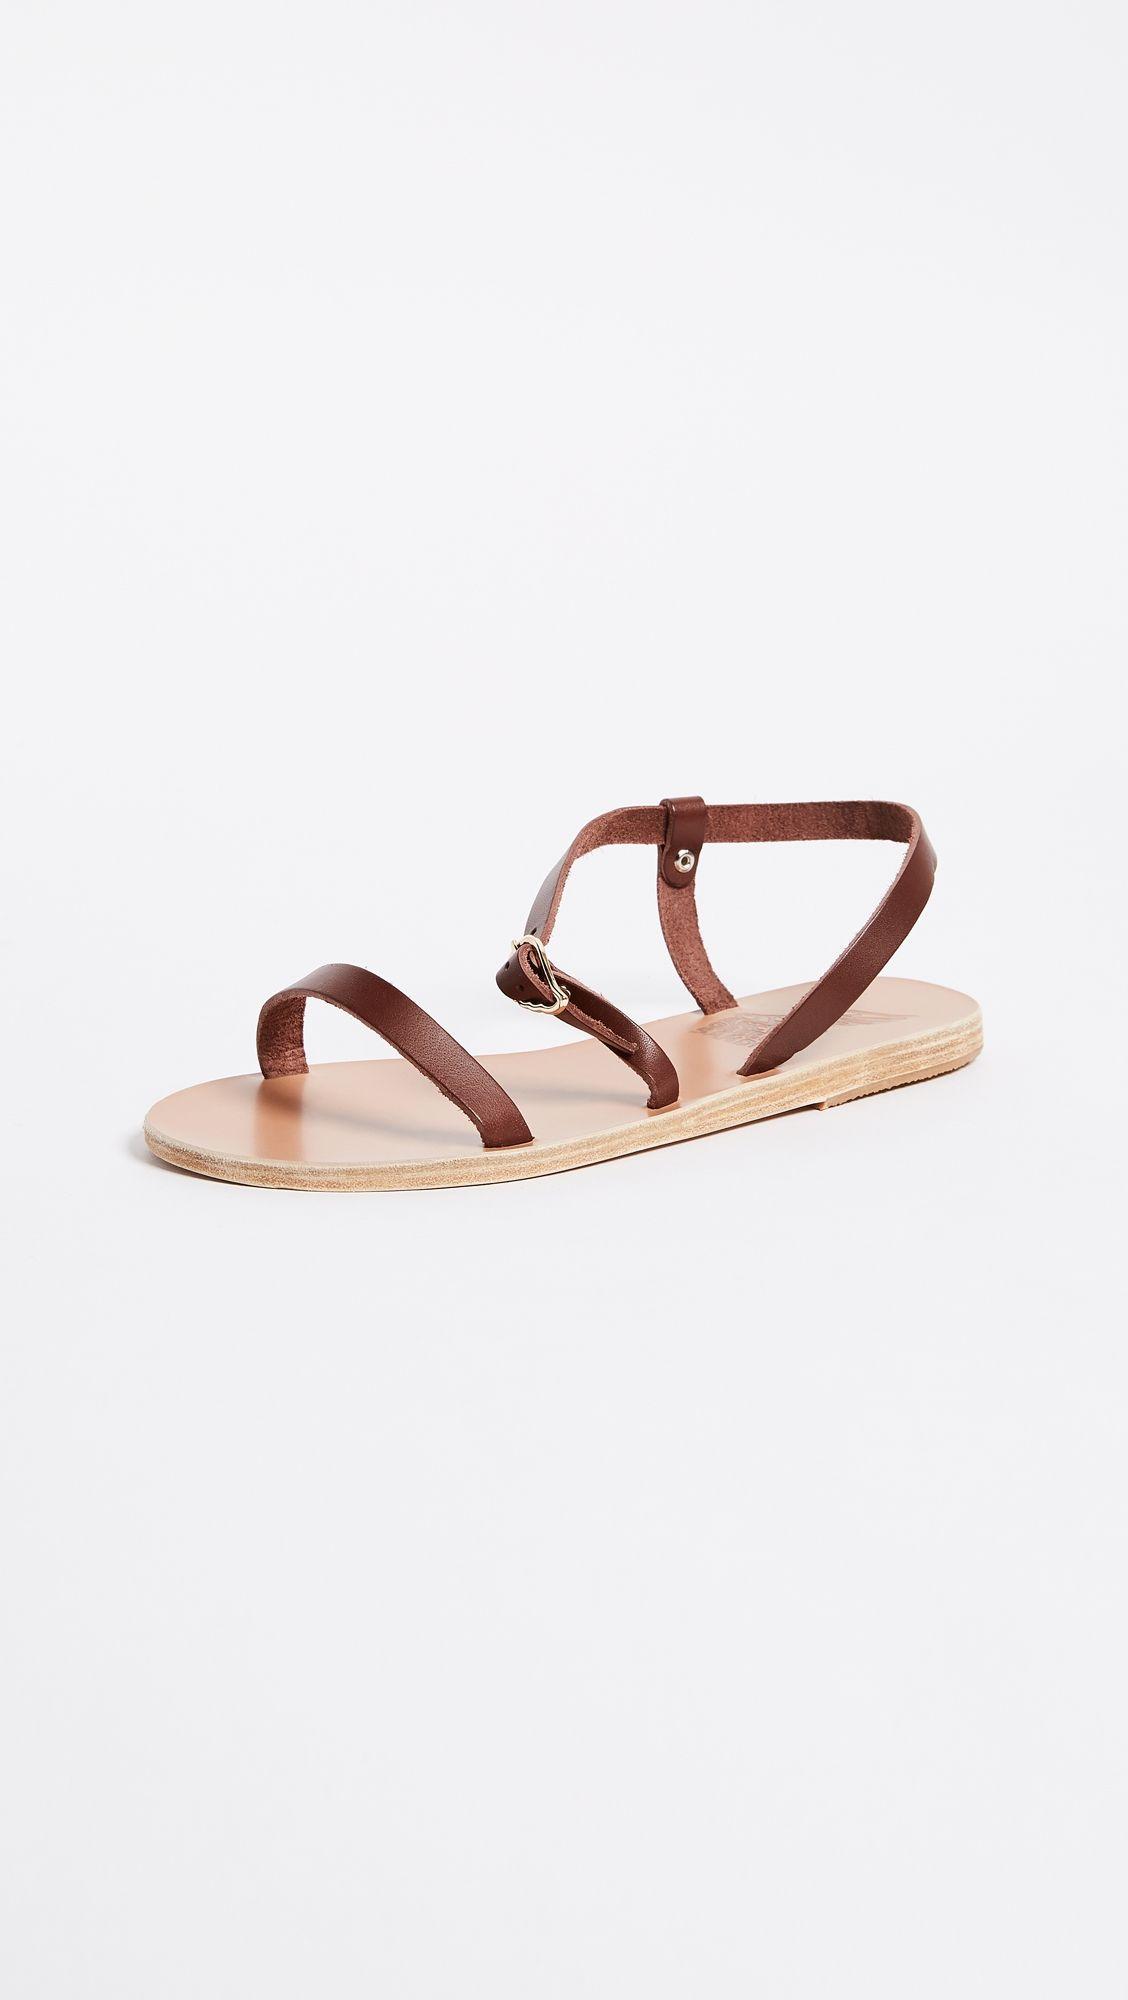 98fda111dff18 Niove Sandals | Products | Greek sandals, Sandals, Ancient greek sandals